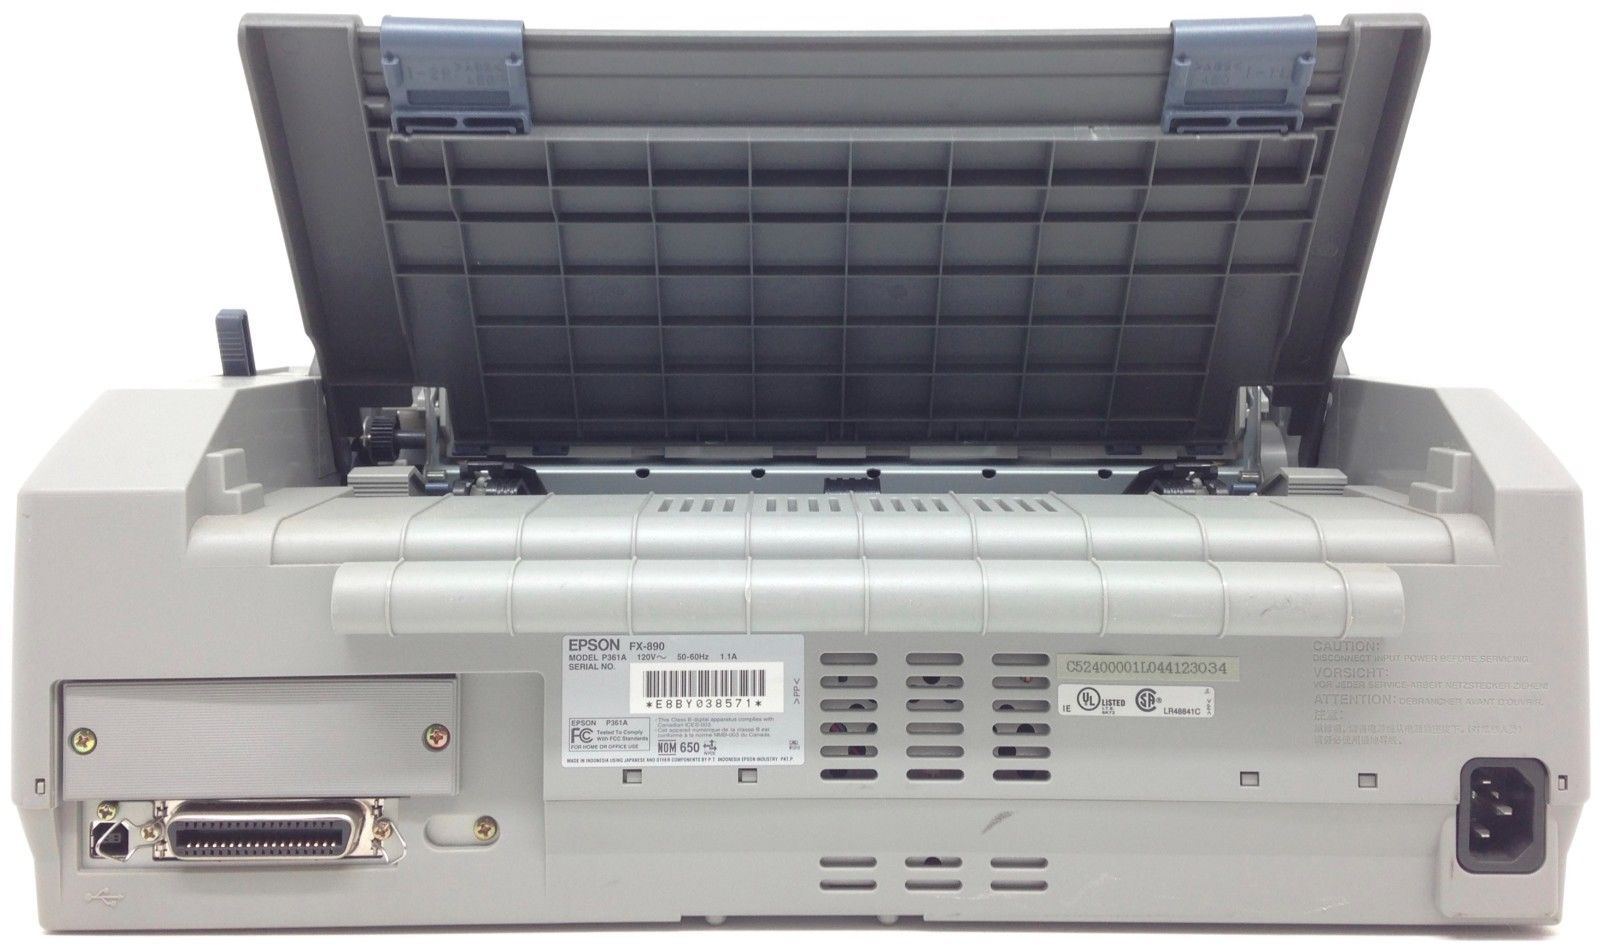 Epson FX-890 tył